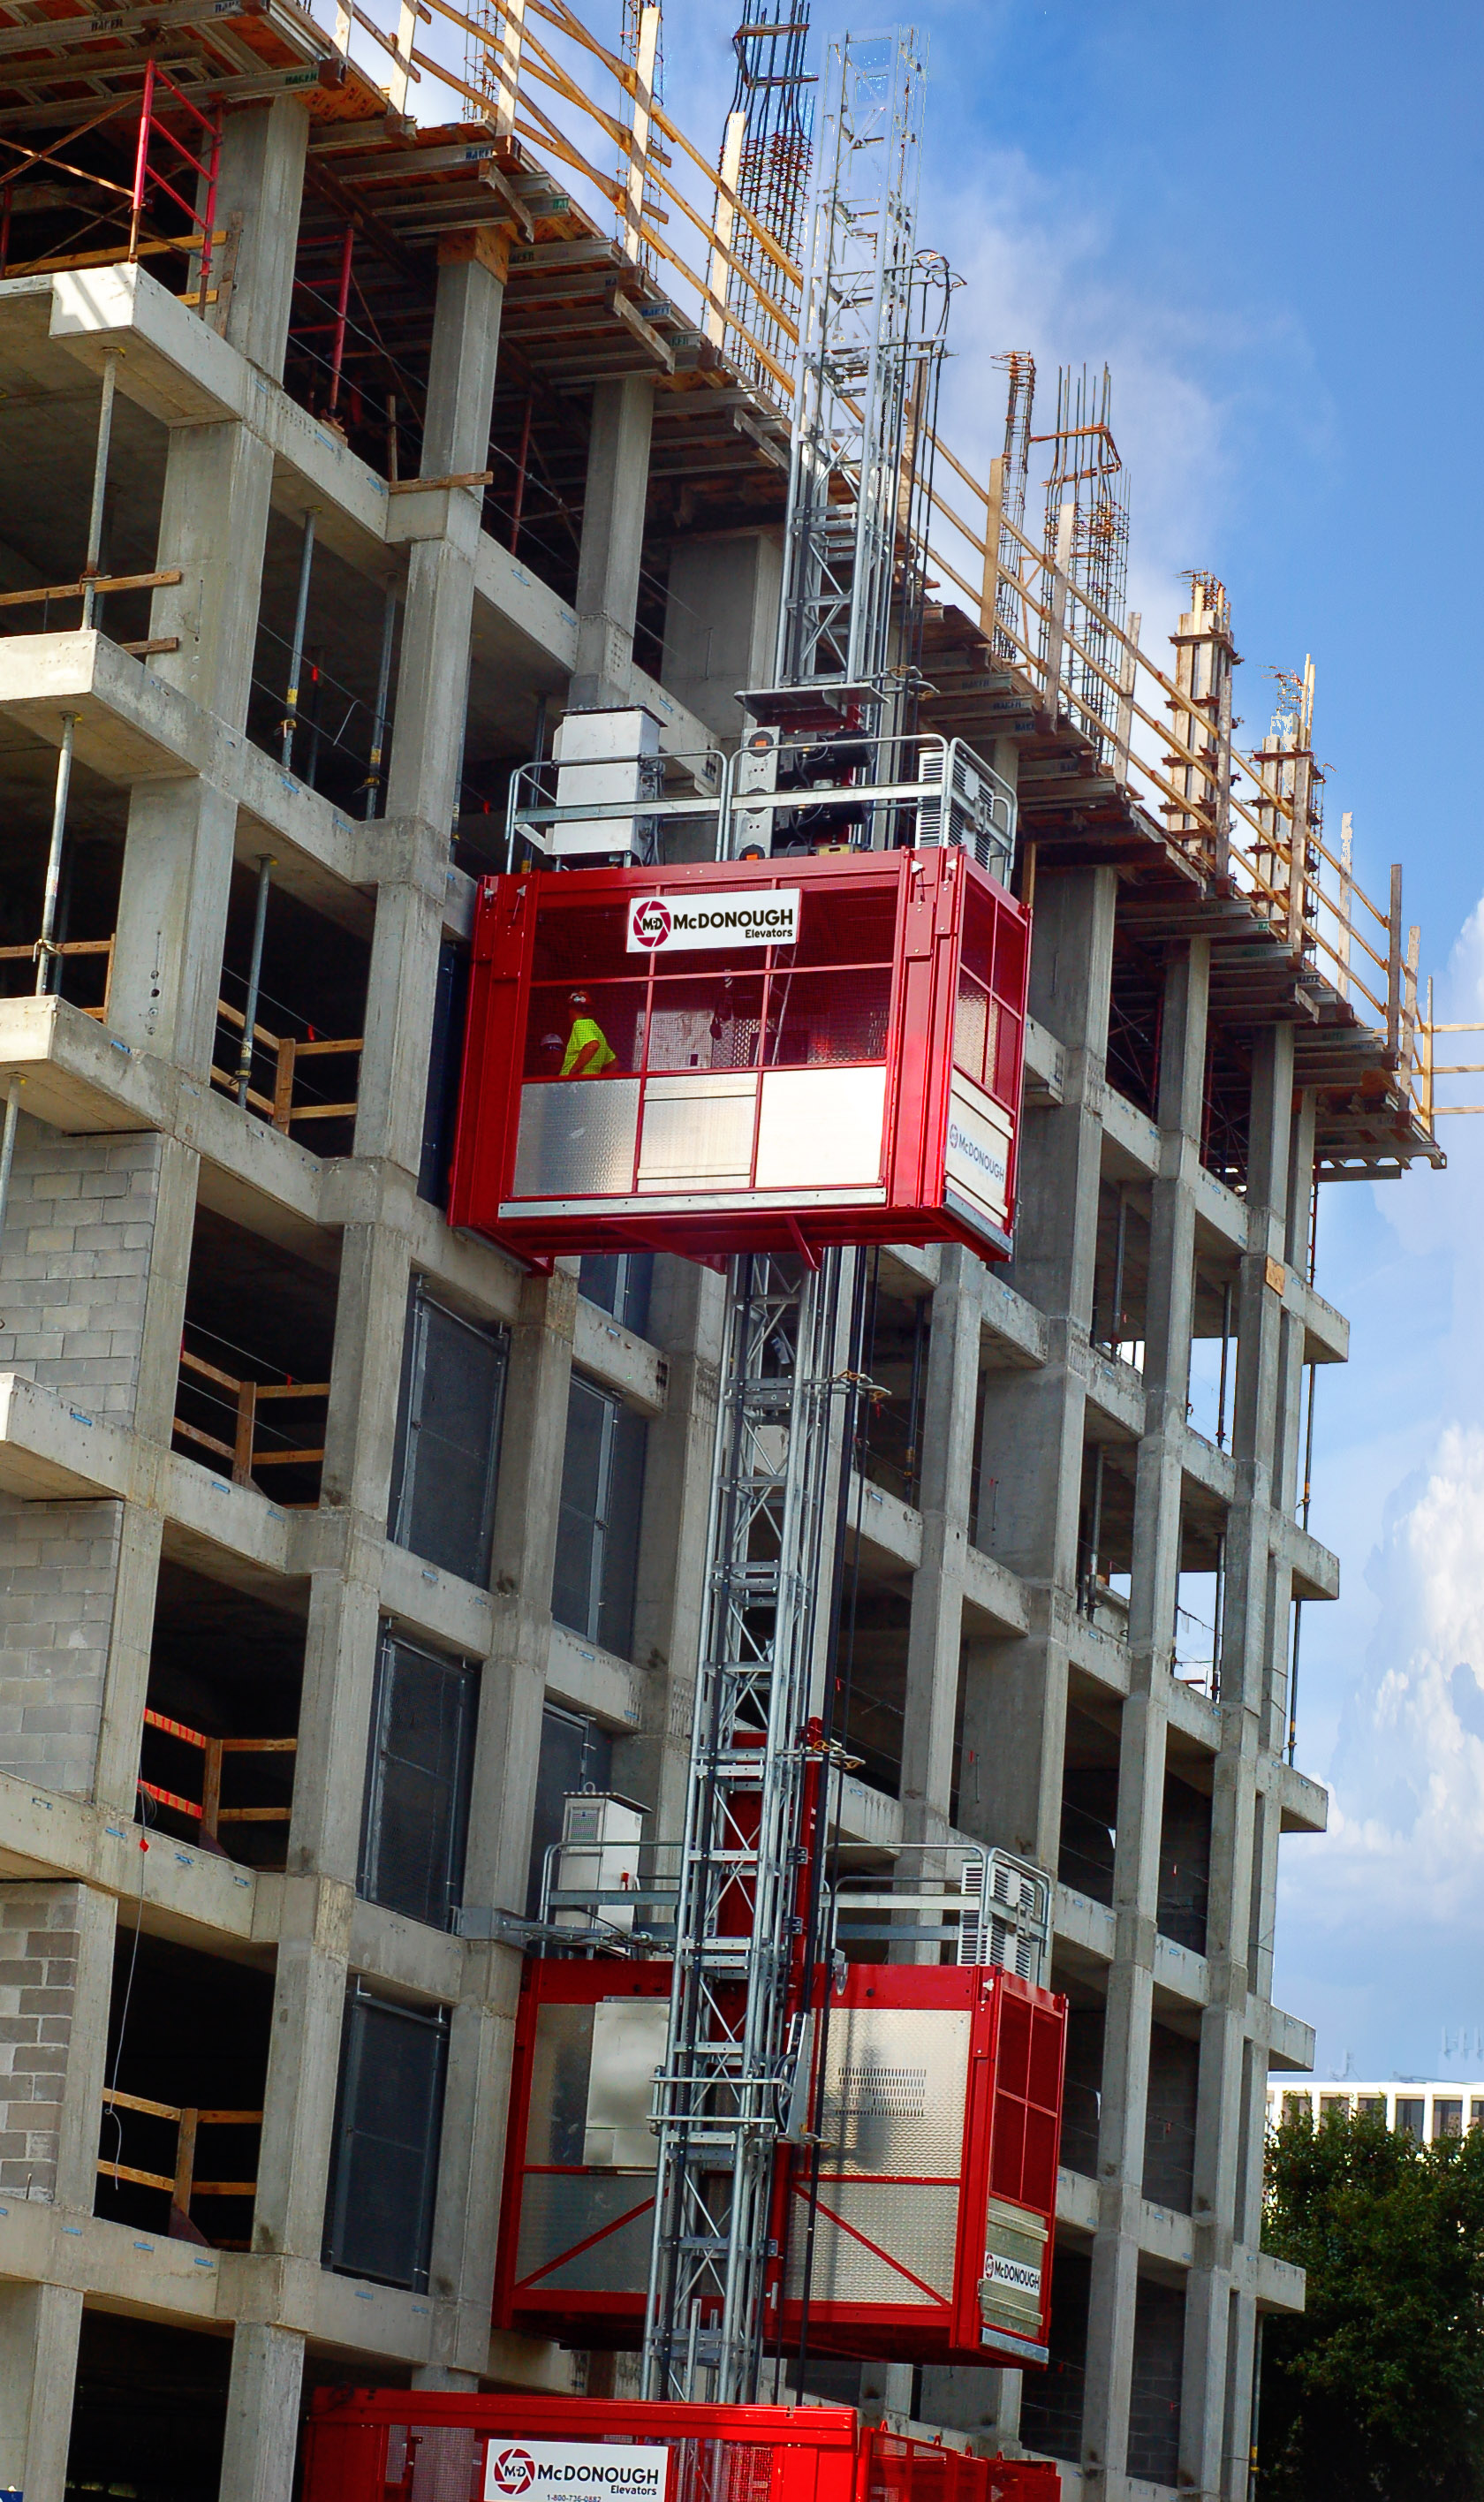 Building Elevator Lifts : Houston based construction hoist supplier expands national